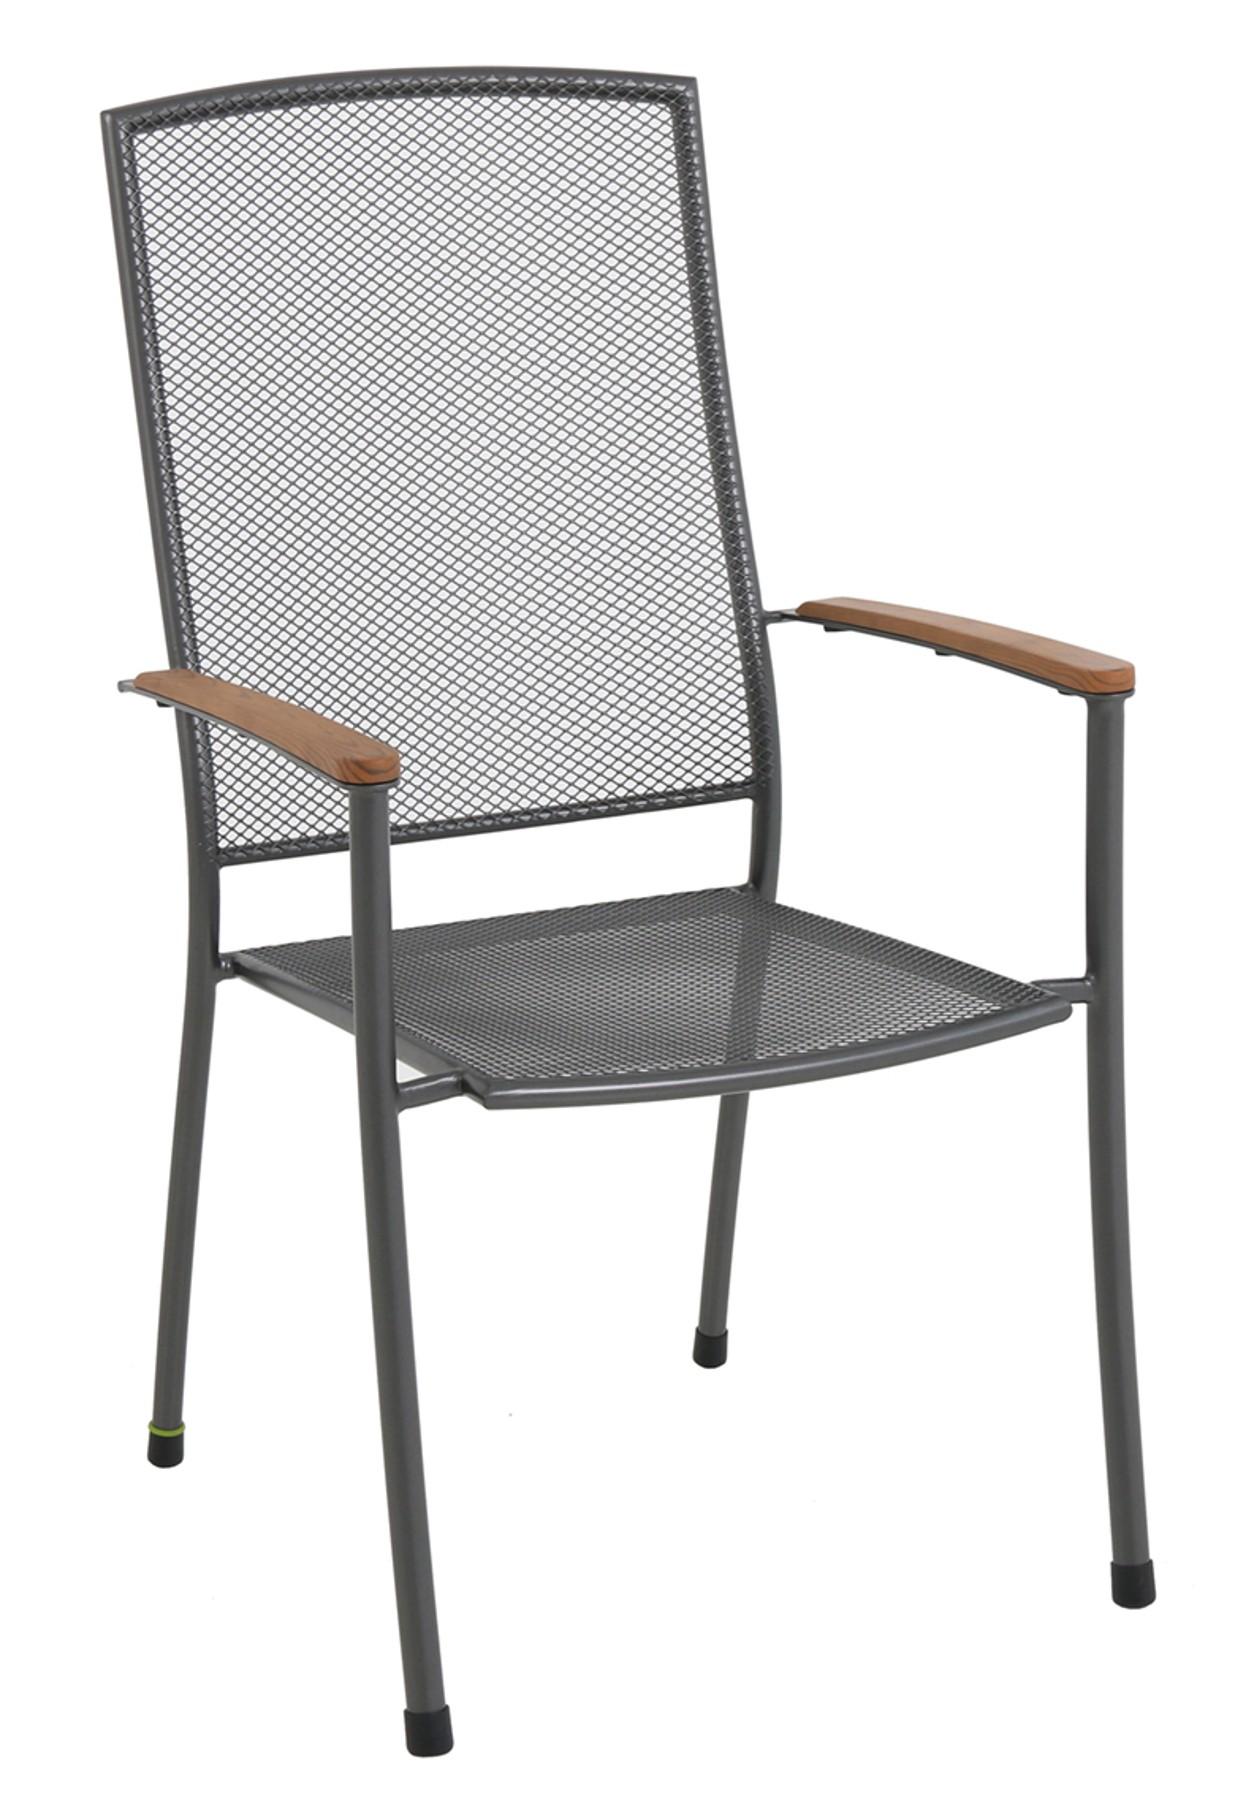 Stohovatelná židle z tahokovu 66,5 x 57,5 x 101 cm MWH Masao GARLAND